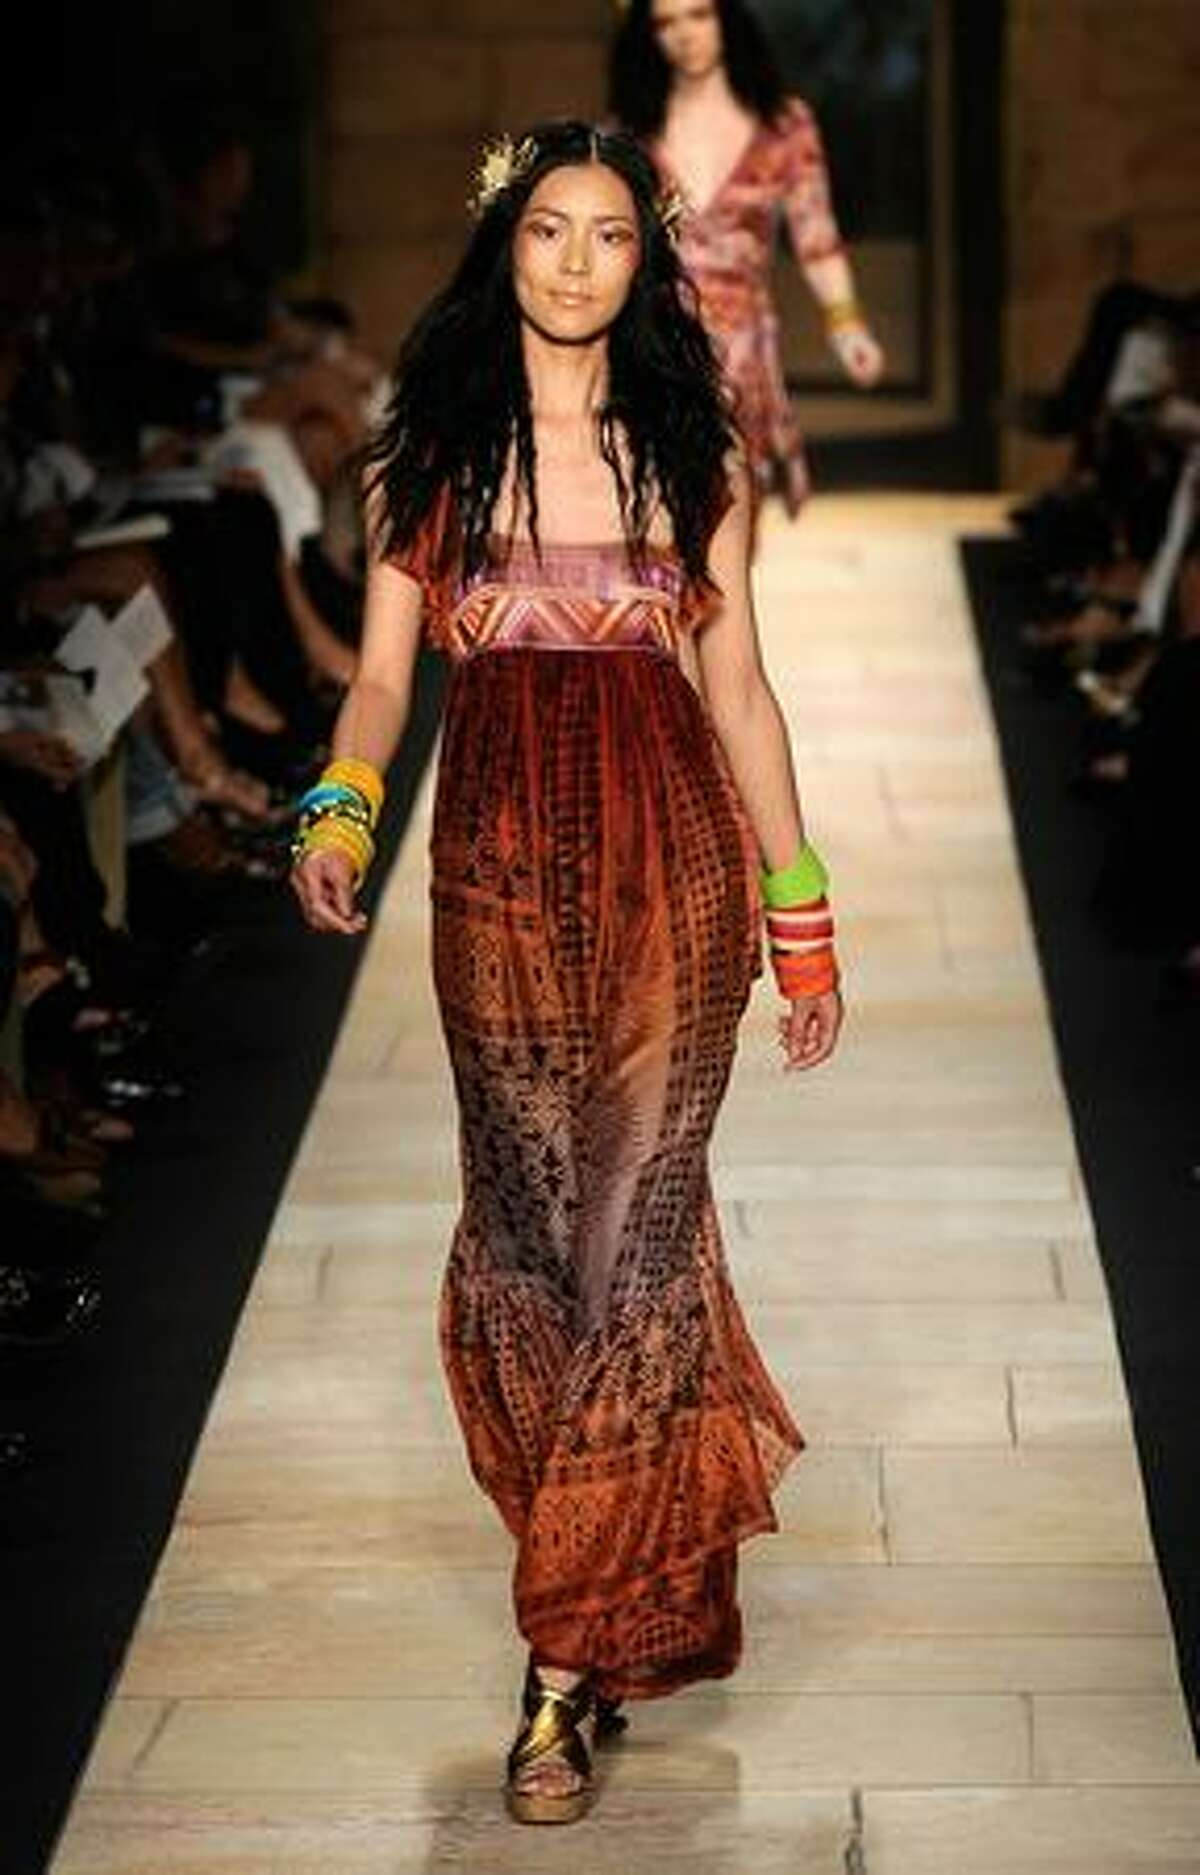 A model walks the runway at Diane Von Furstenberg Spring 2010 Fashion at Bryant Park on Sunday in New York City.